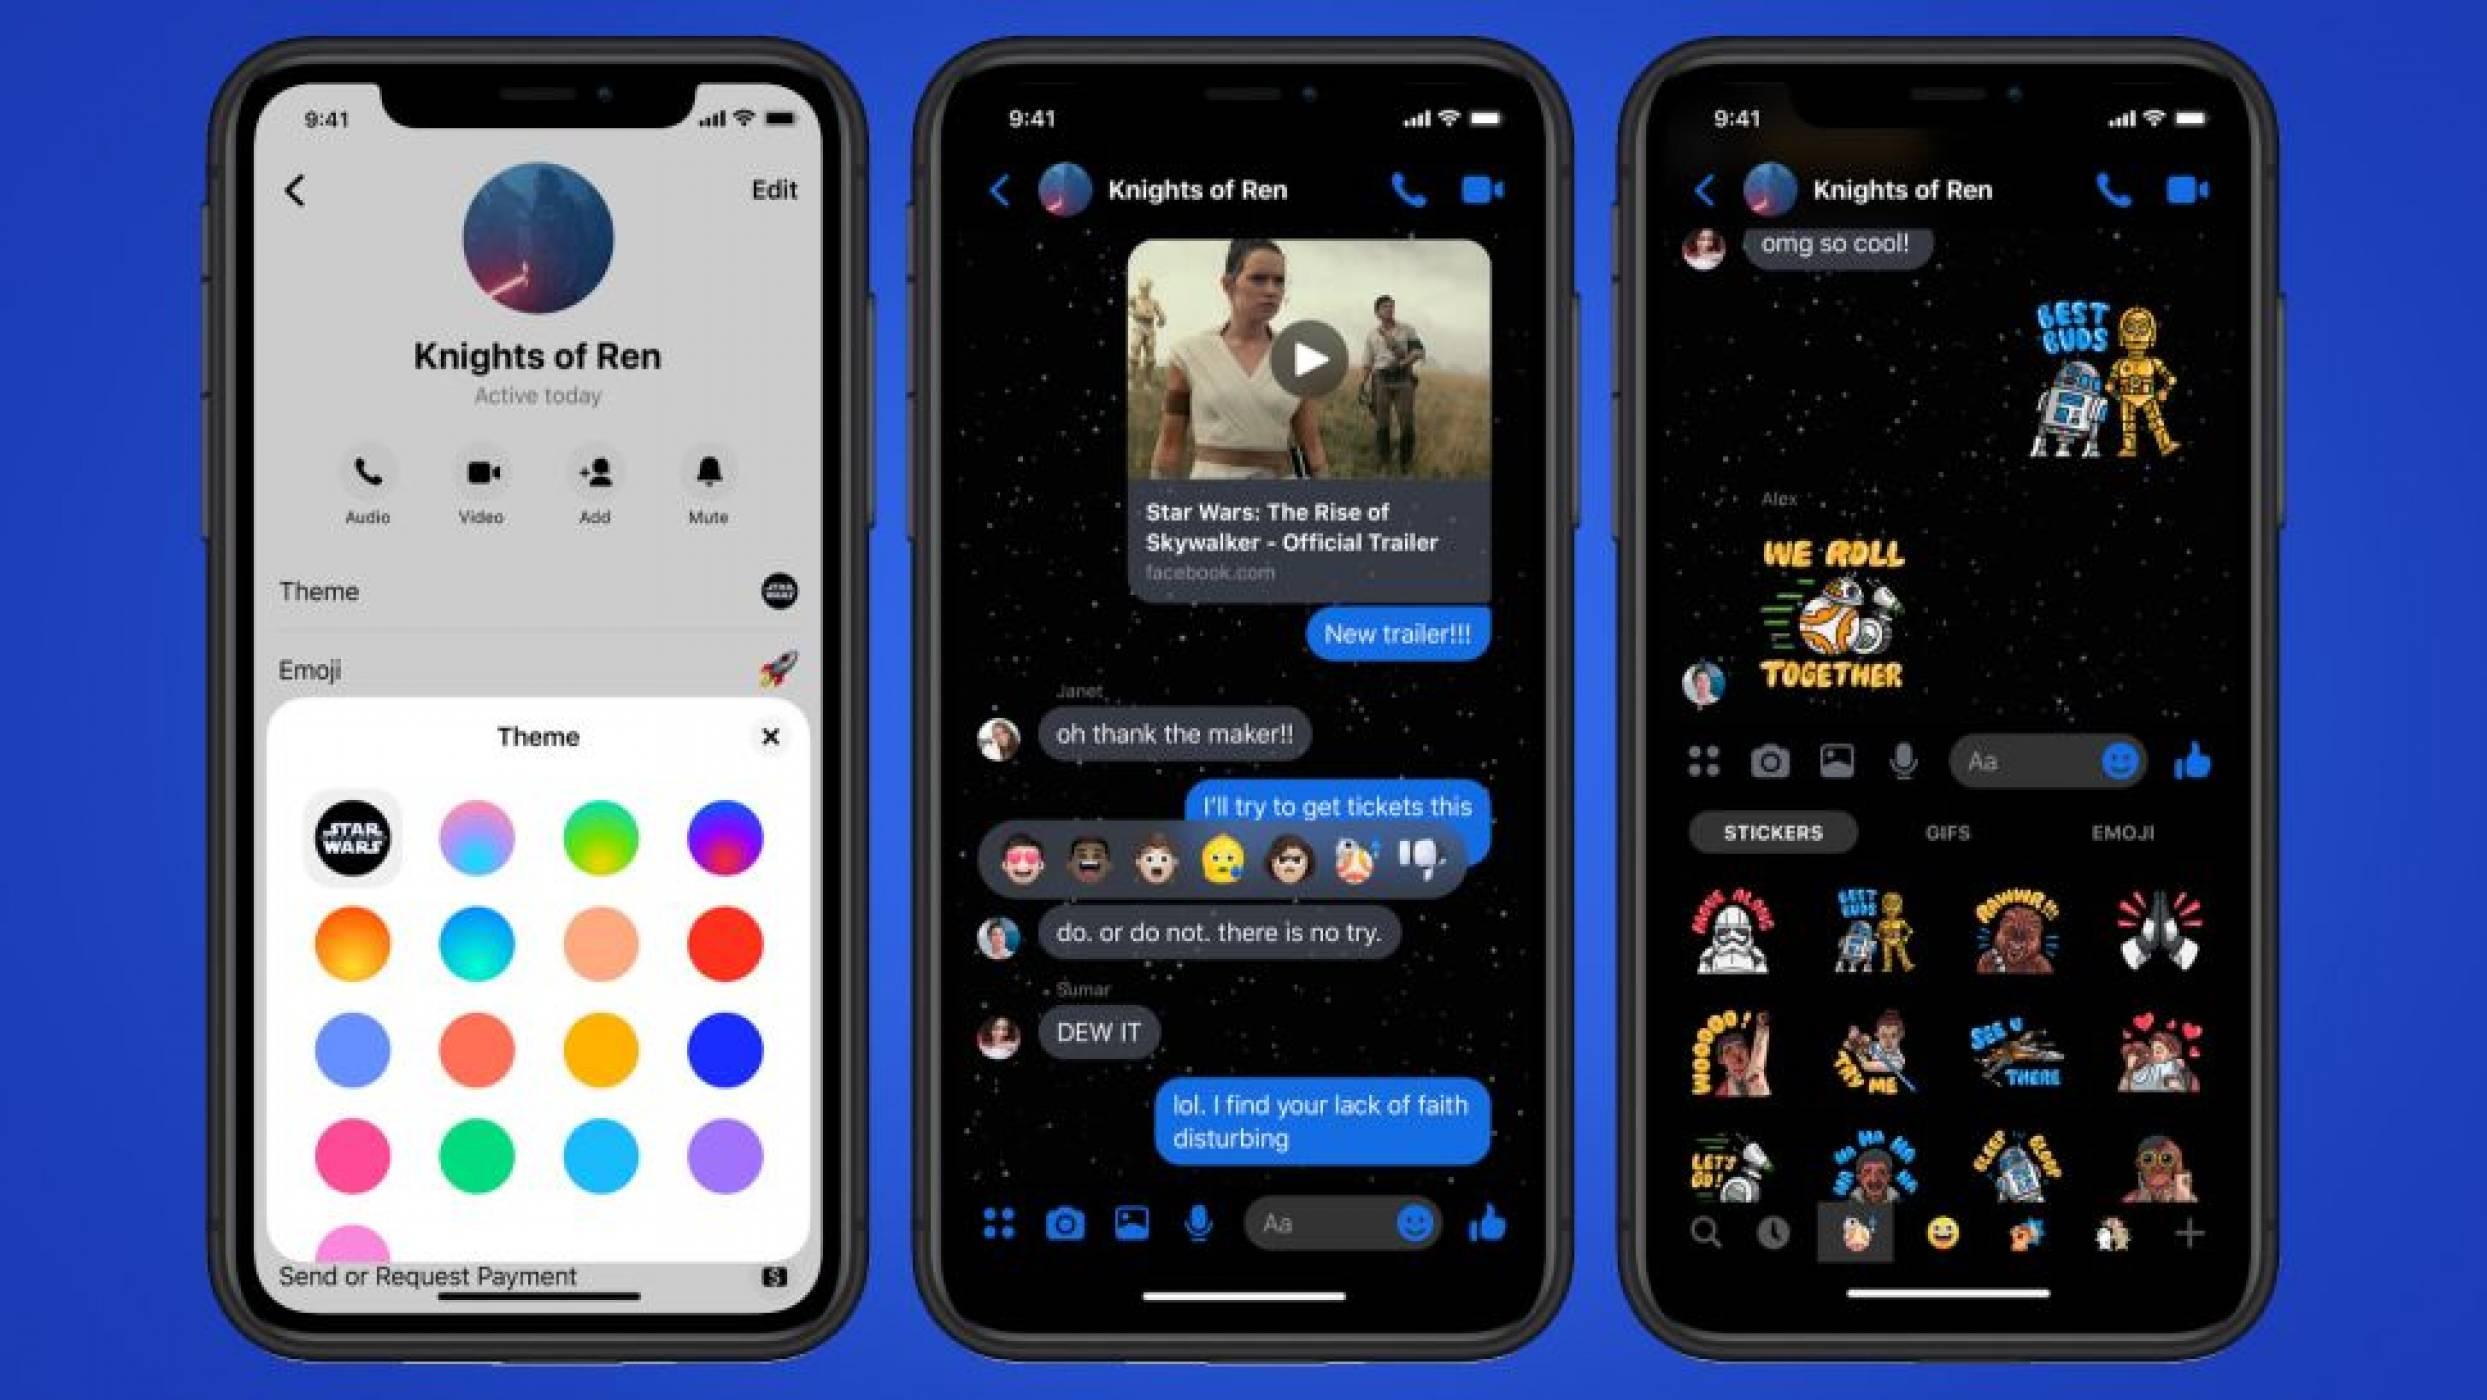 Star Wars вече и във Facebook Messenger